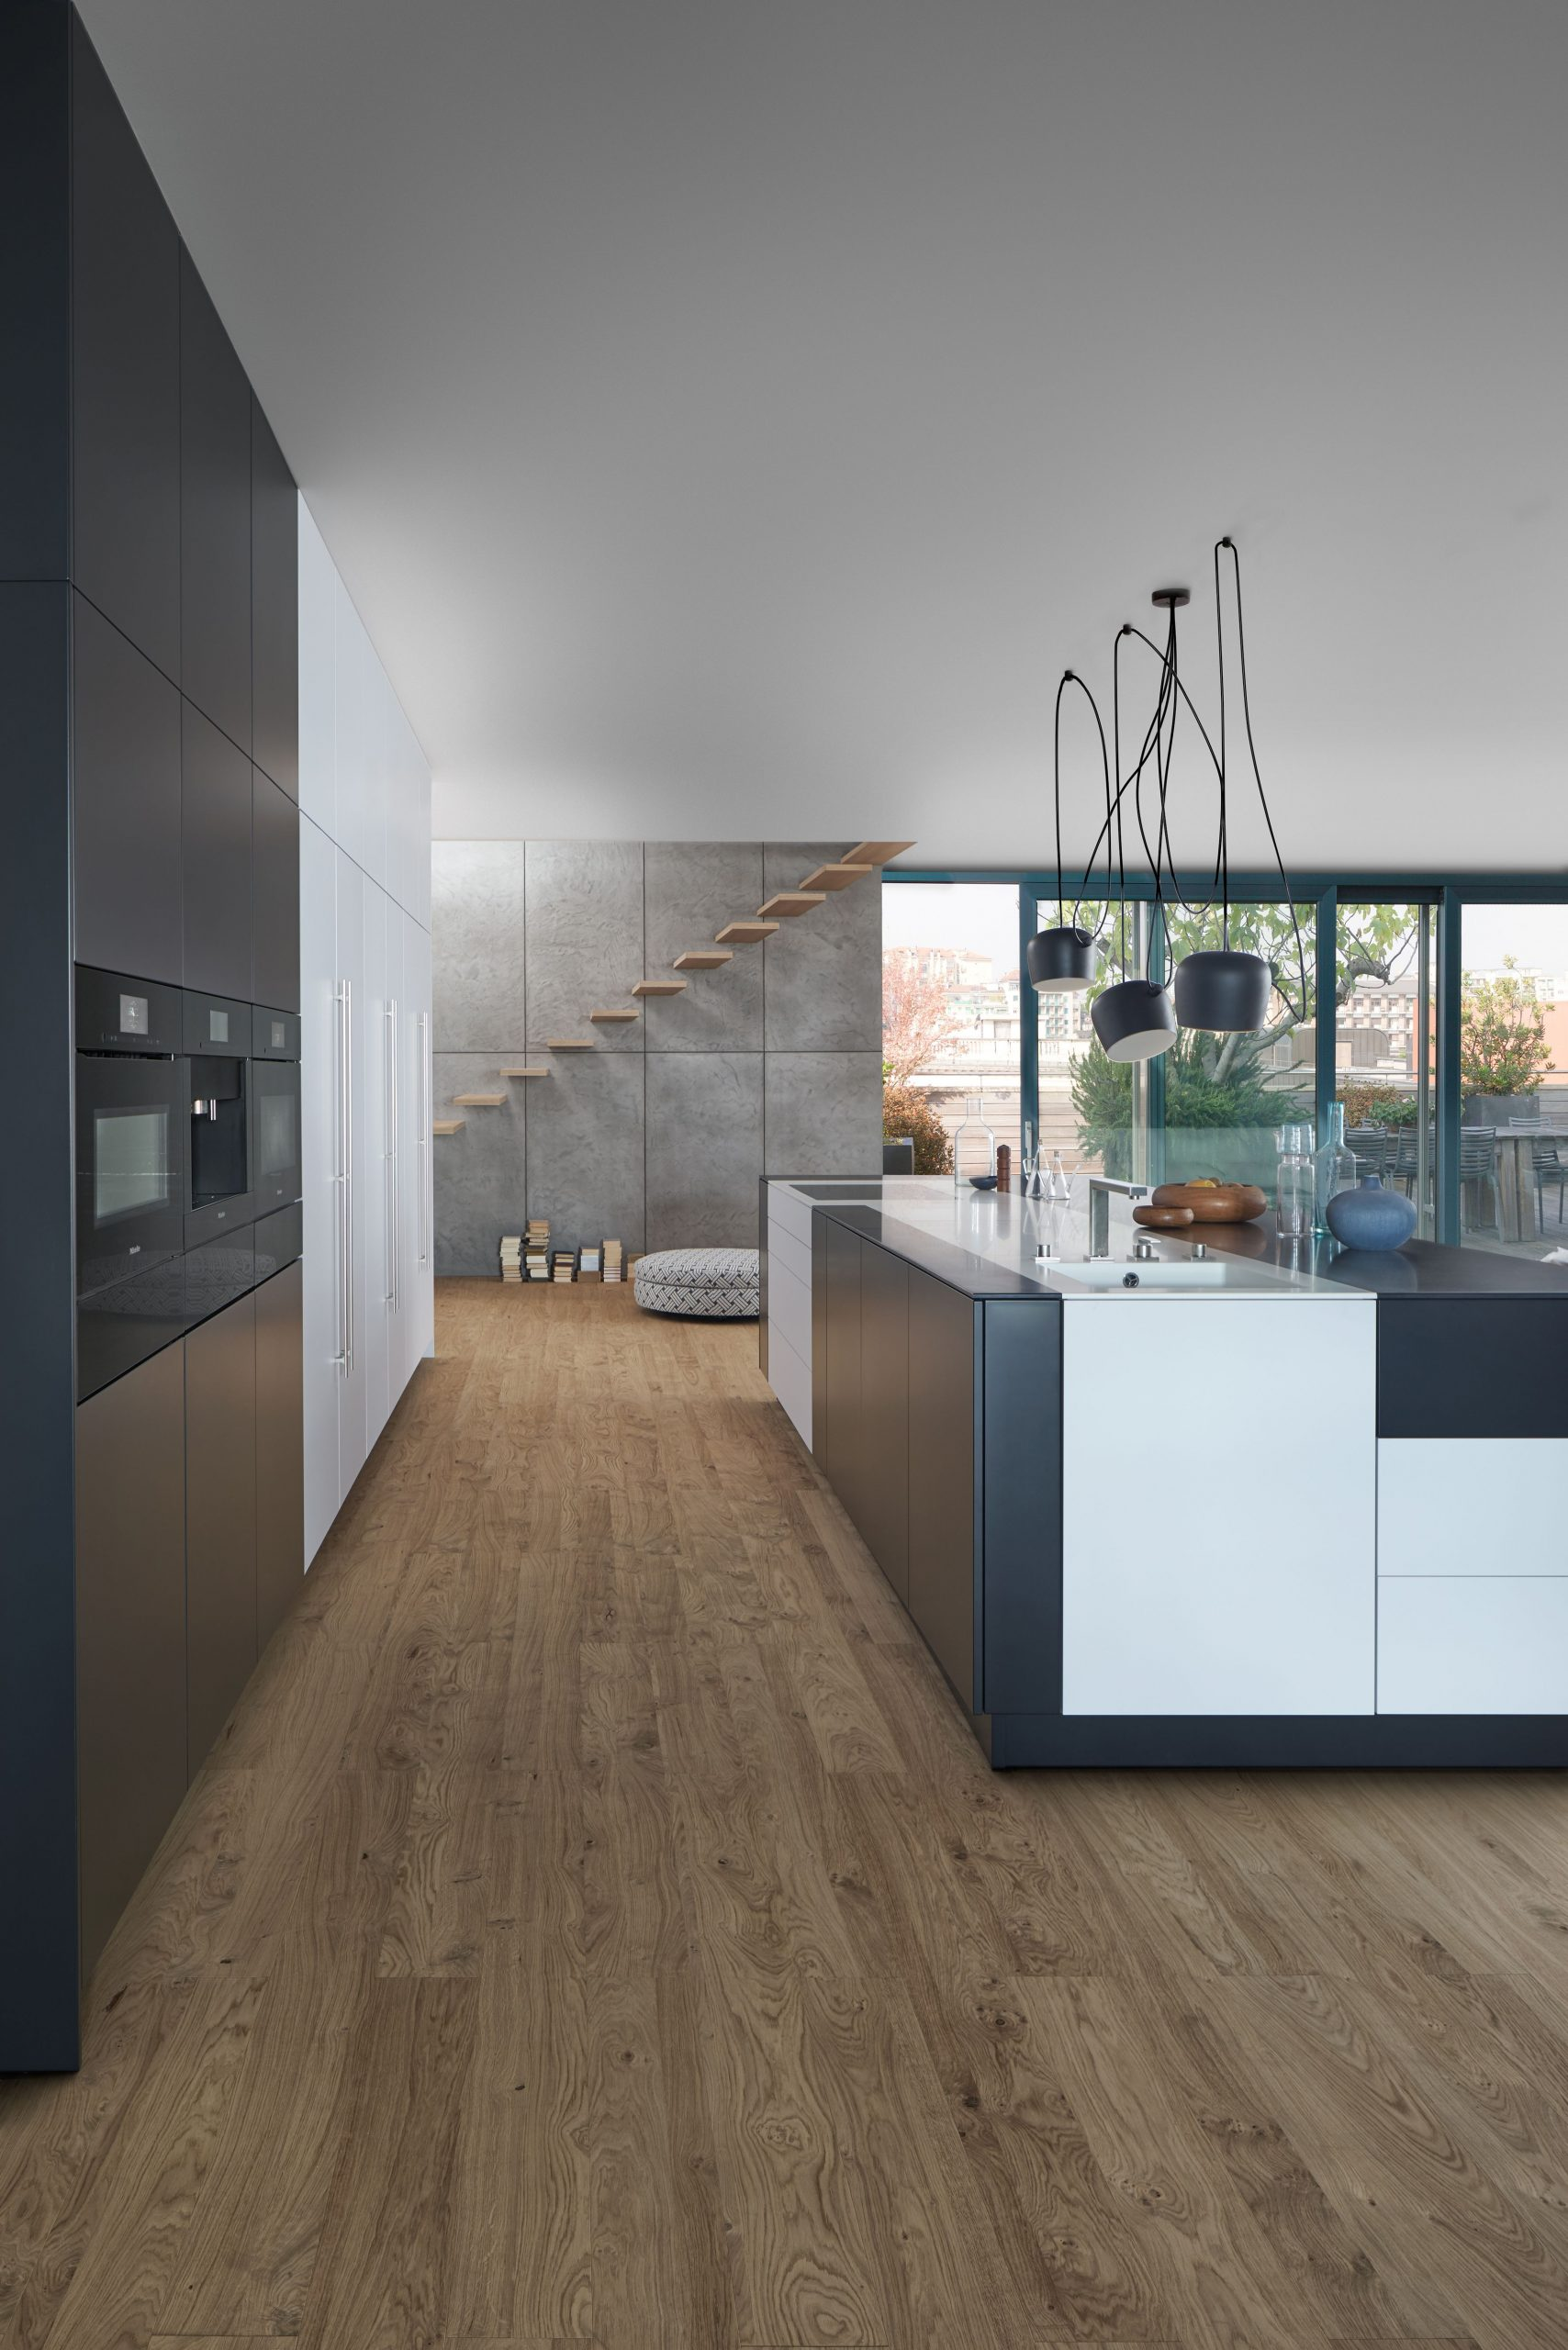 Full Size of Boden Unter Küche Verlegen Boden Küche Verlegen Bodenbelag Auf Fliesen Küche Bodenbelag Küche Bauhaus Küche Bodenbelag Küche